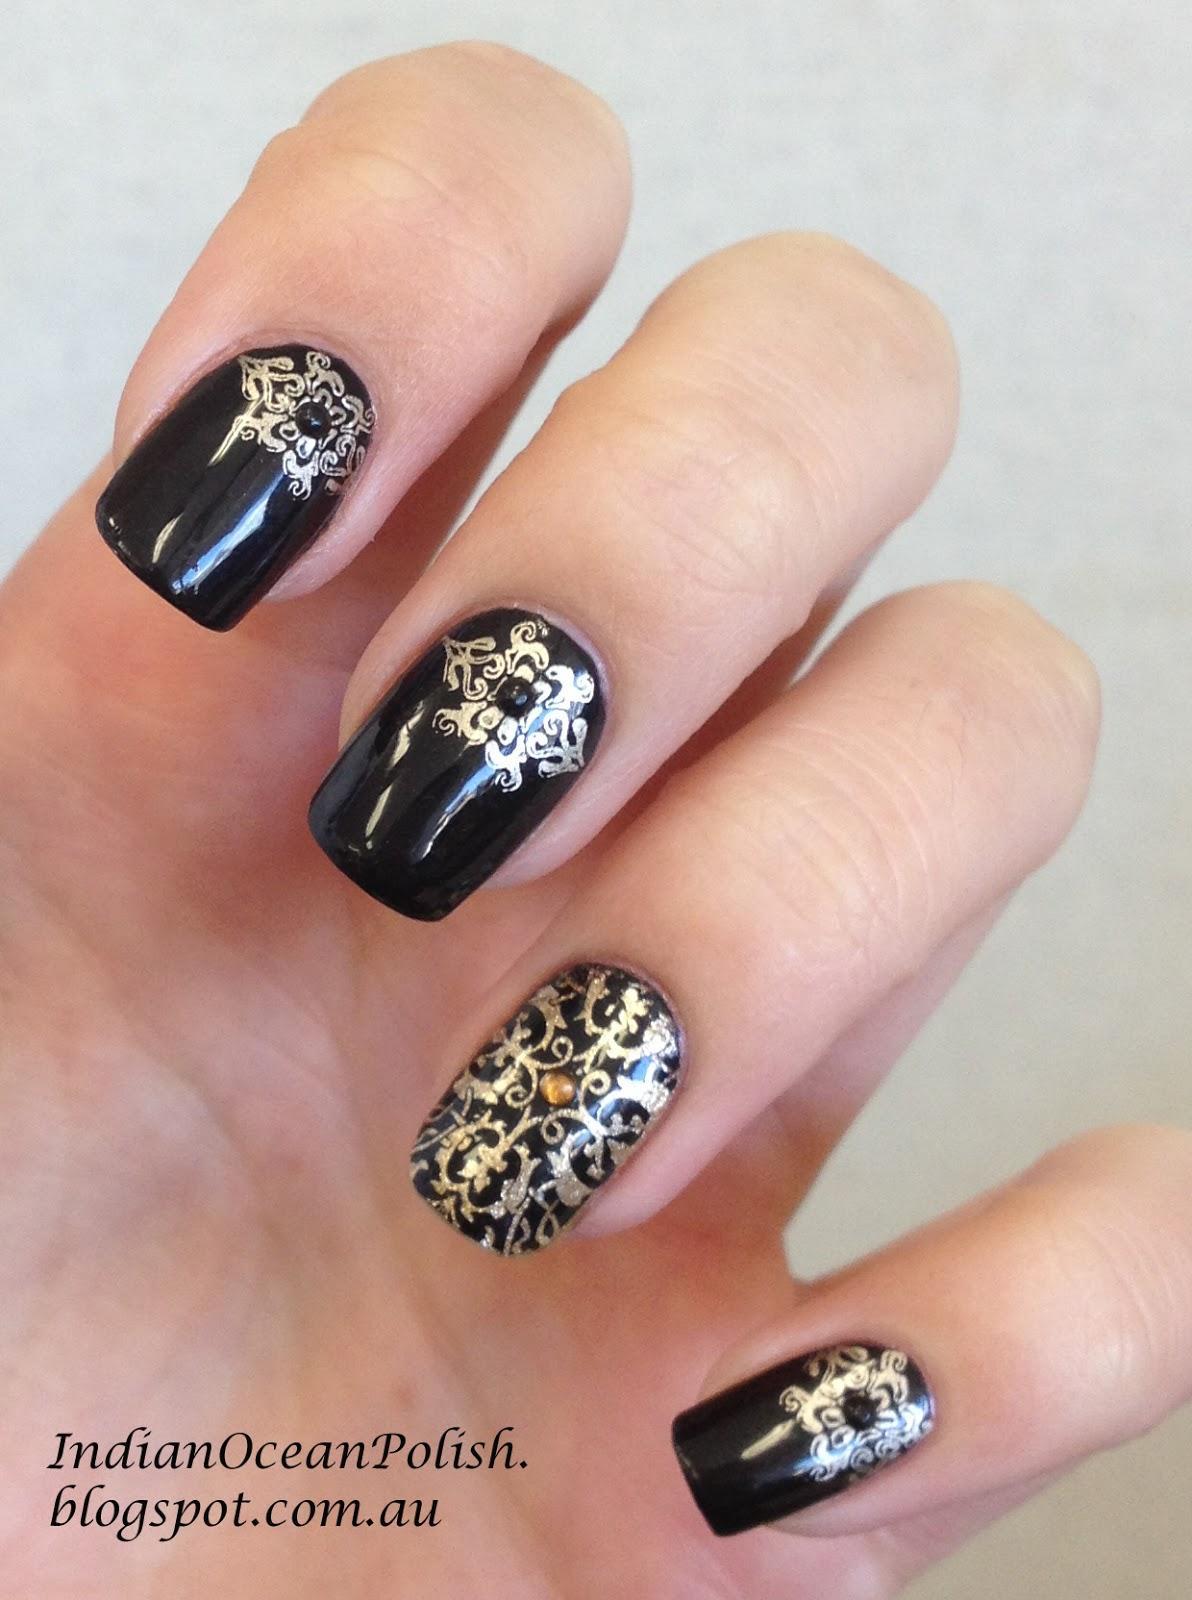 Printable Nail Art Designs - Free Printable Nail Art Designs